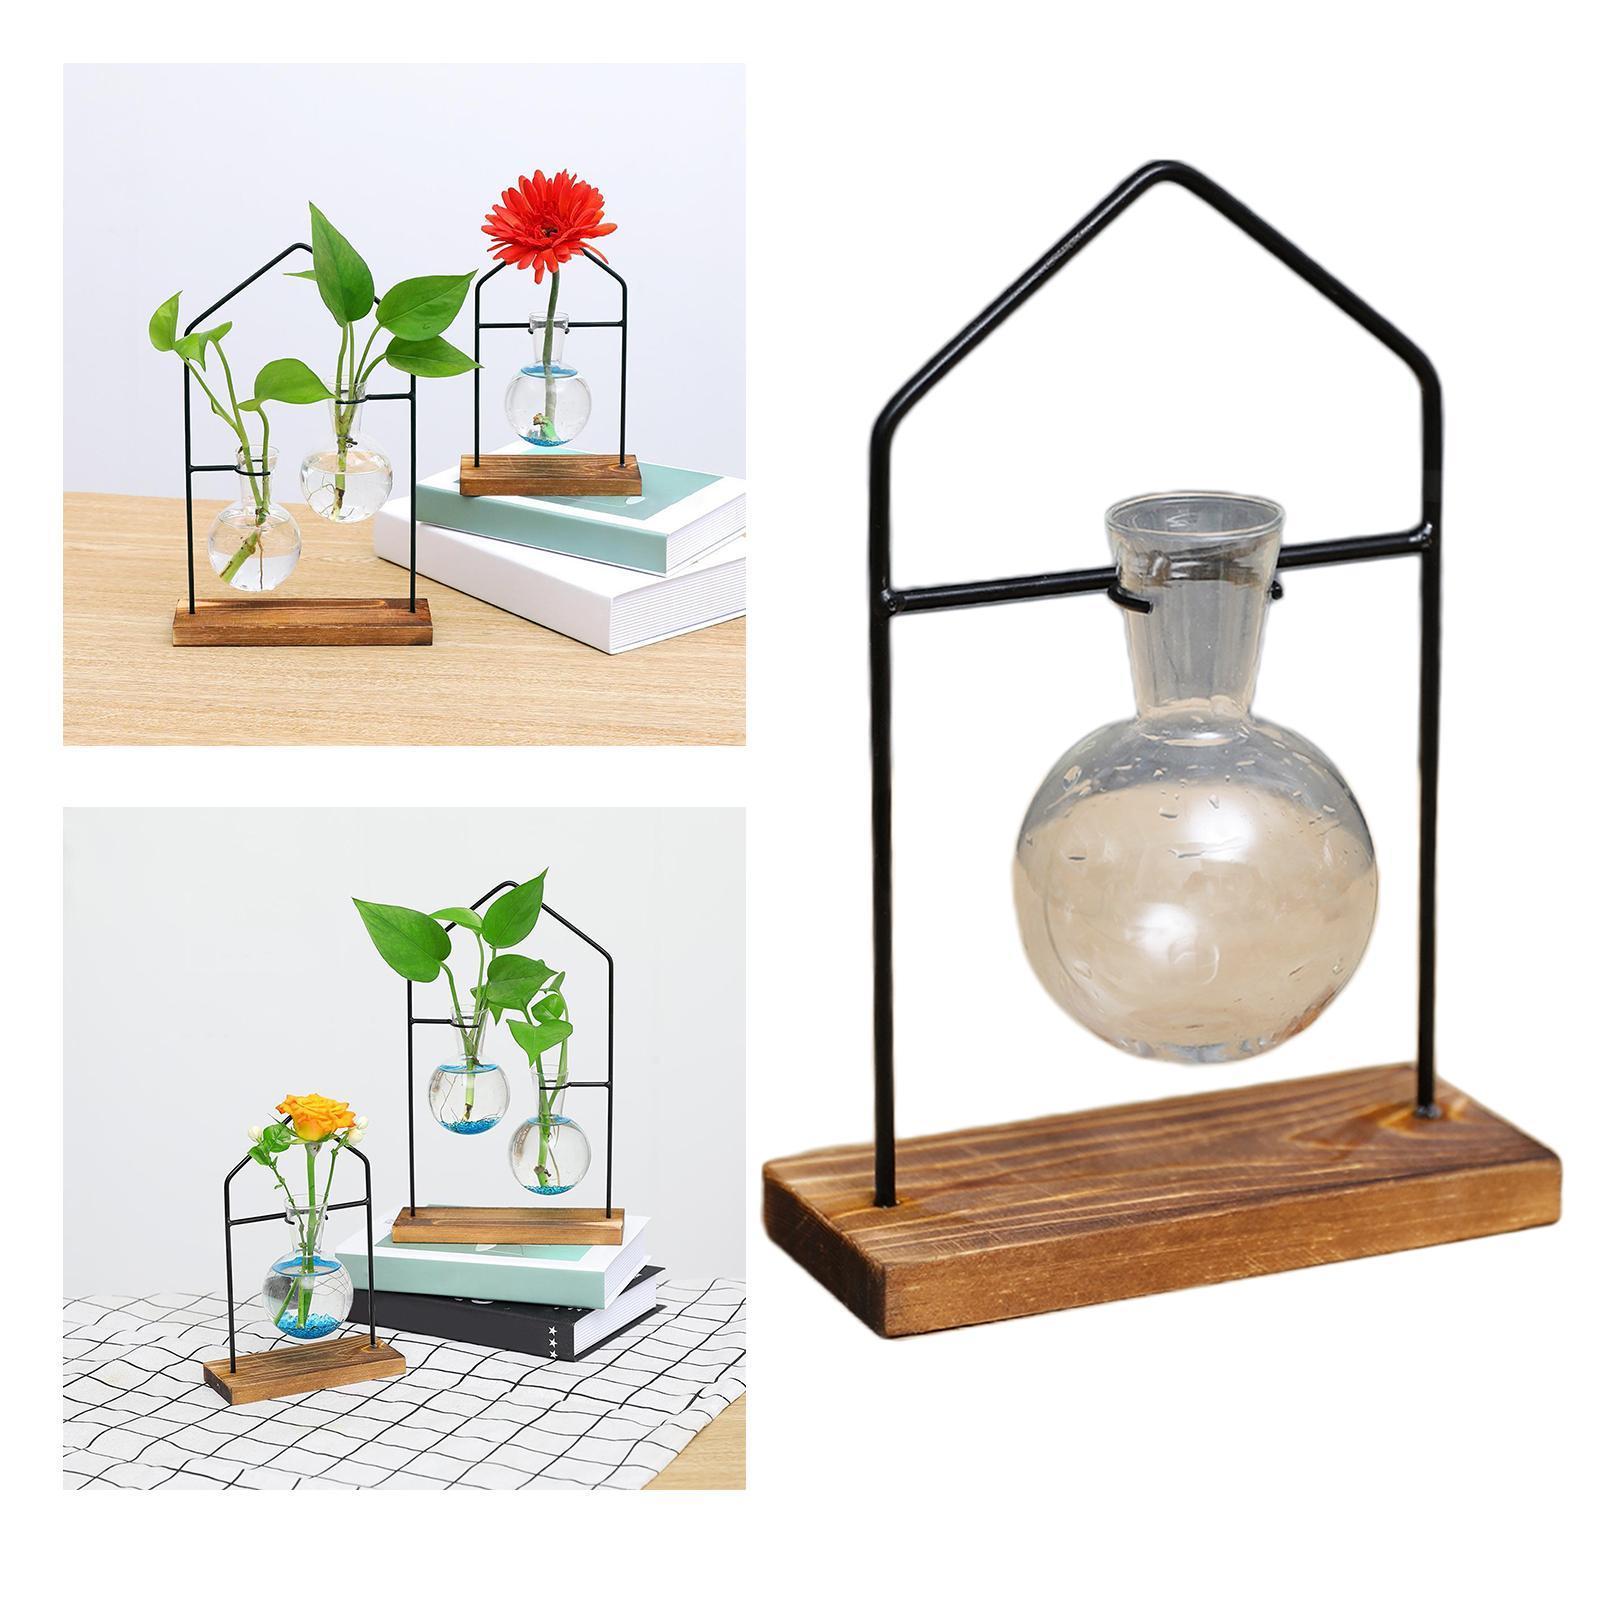 thumbnail 4 - Hydroponic Bonsai Plant Glass Vase Flower Pot Wood Stand Desk Decor